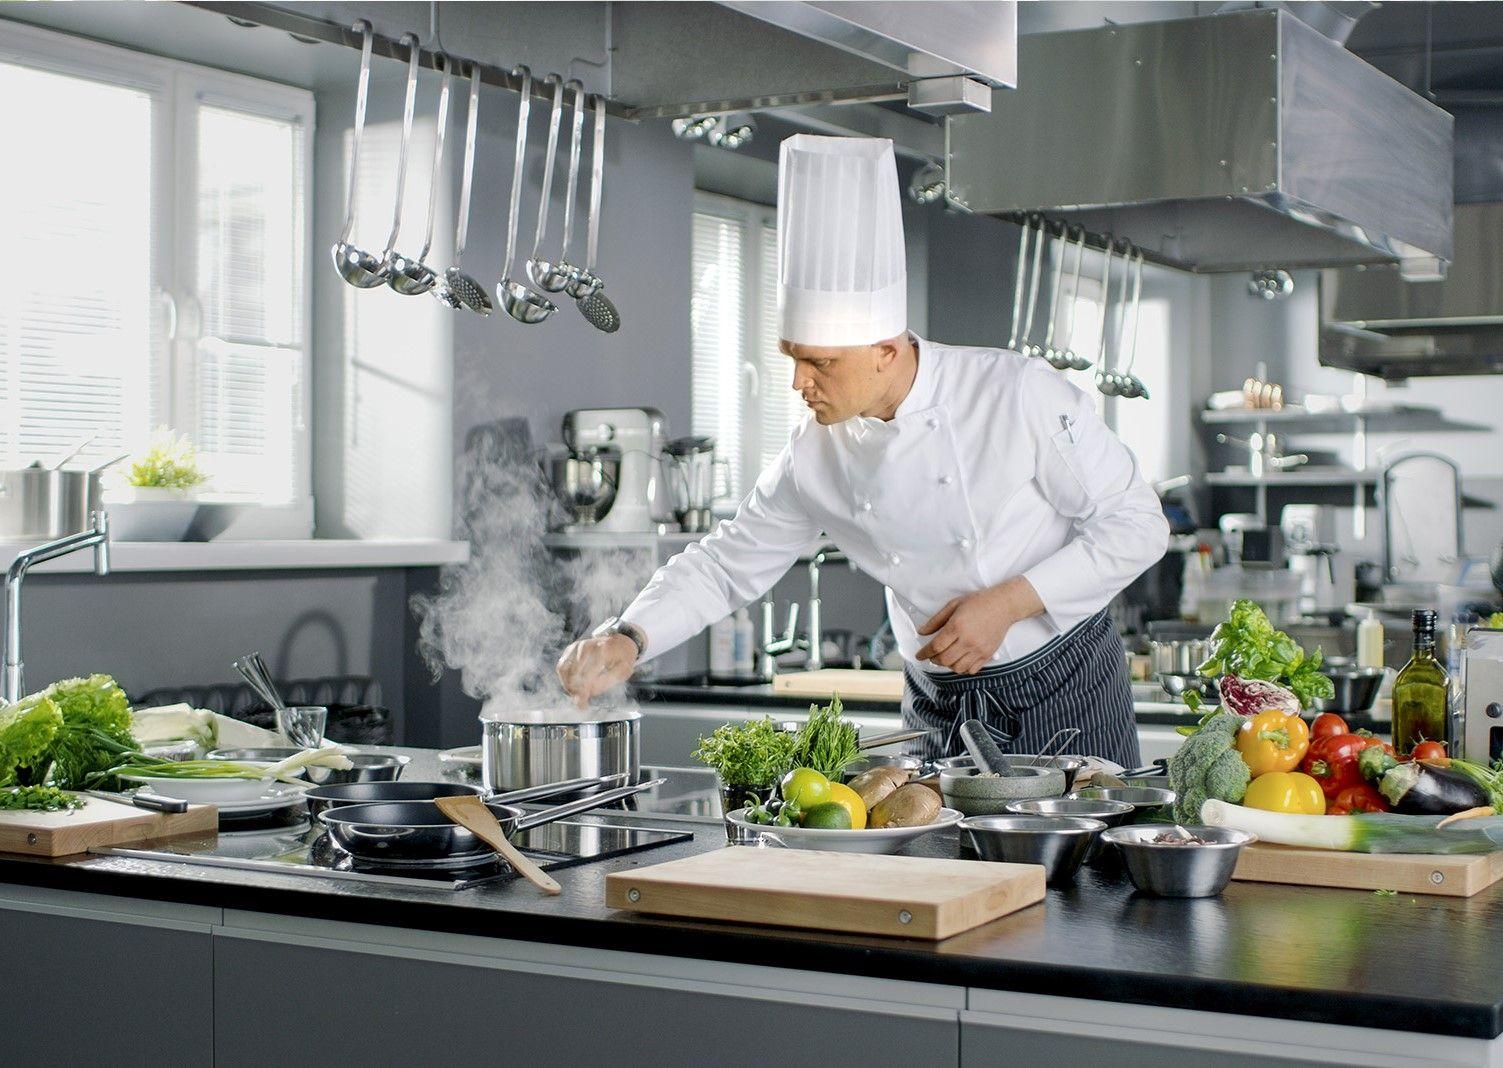 مدیریت آشپزخانه رستوران